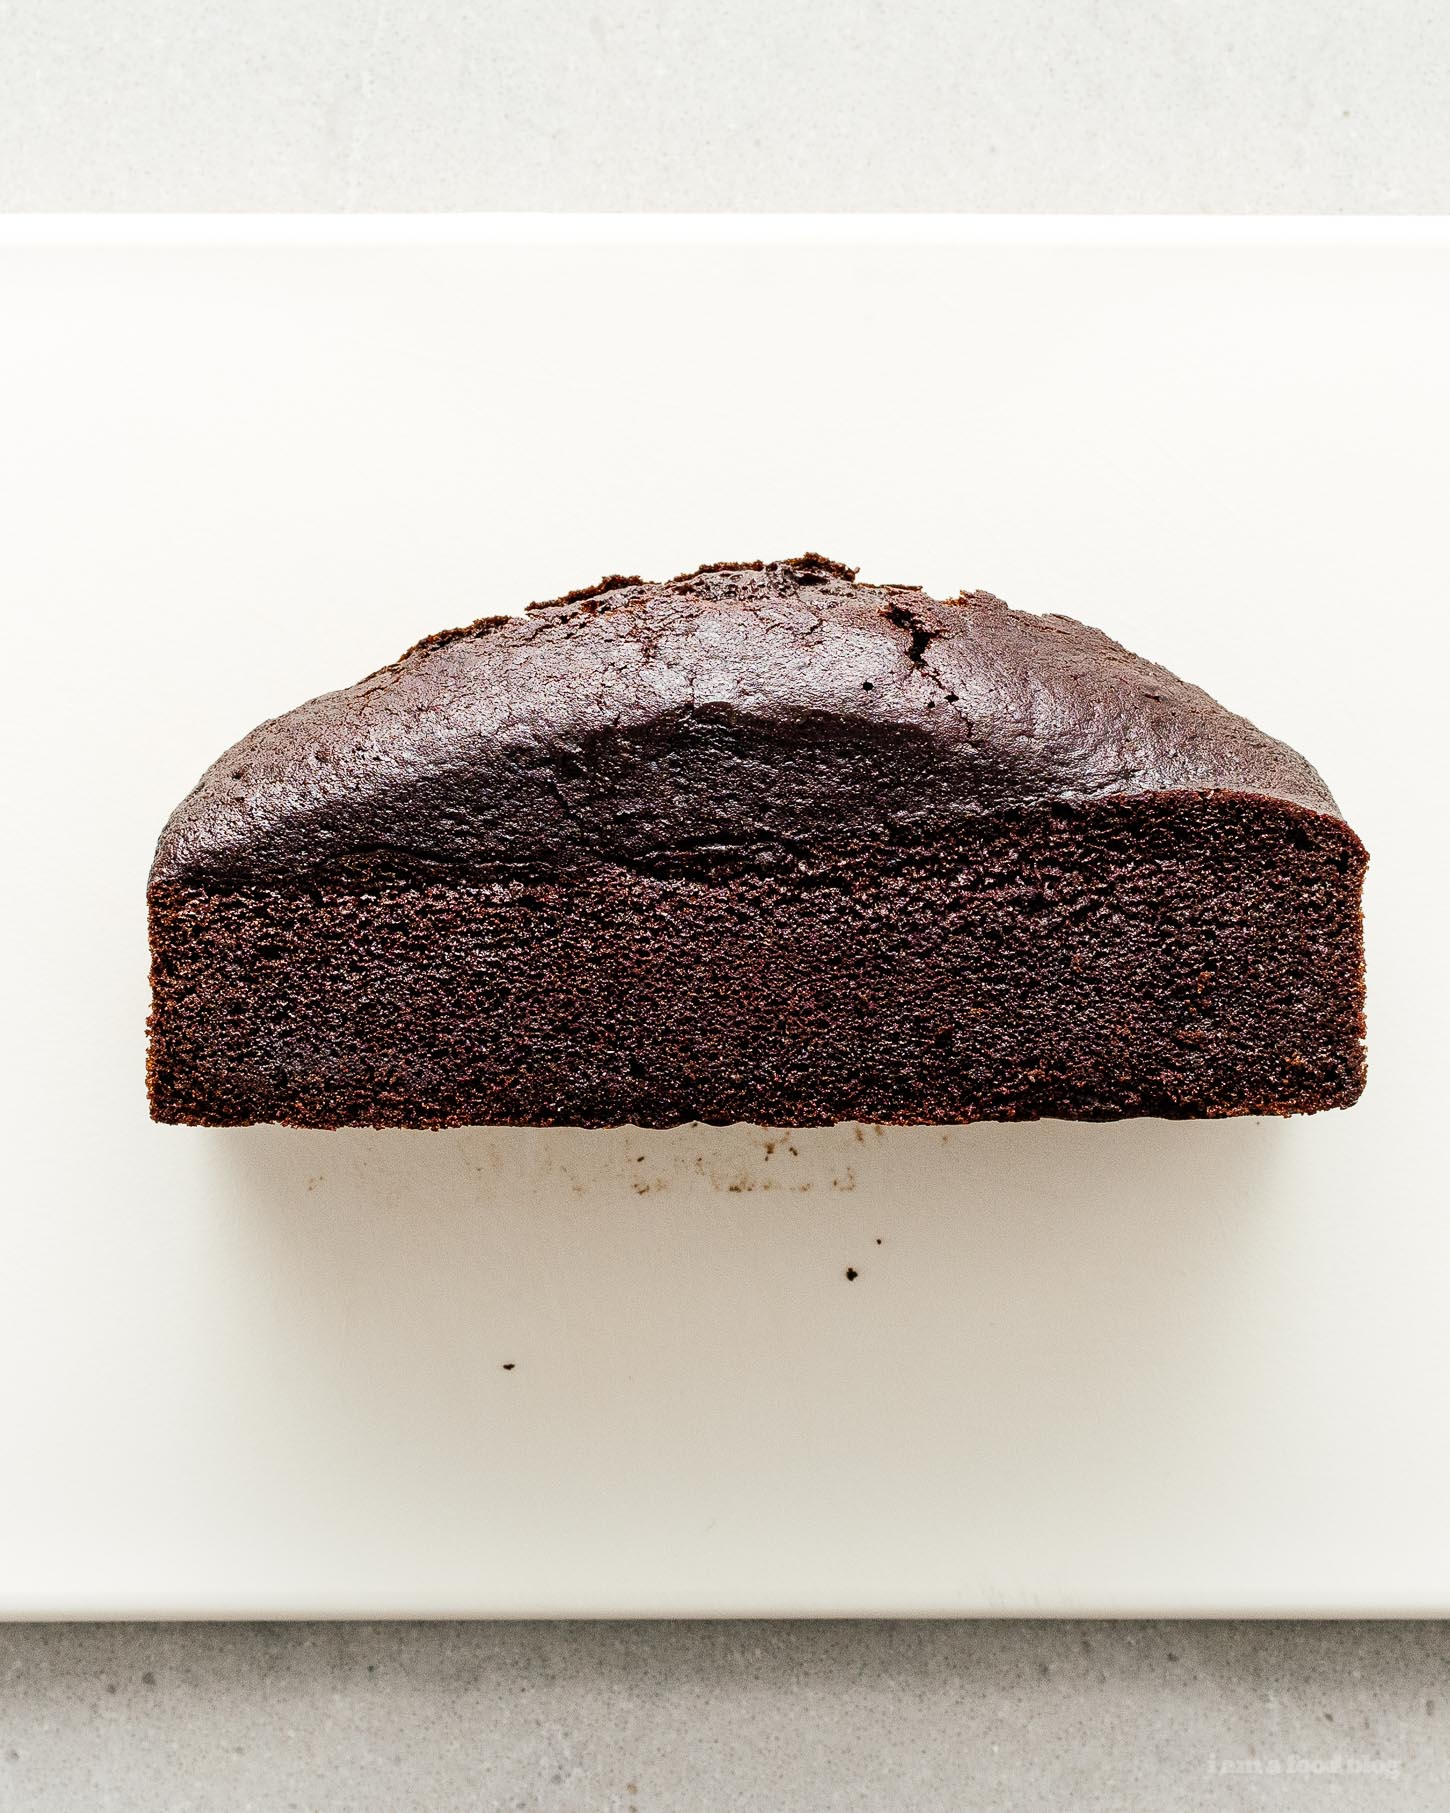 Mini Chocolate Loaf Cake Recipe | www.iamafoodblog.com